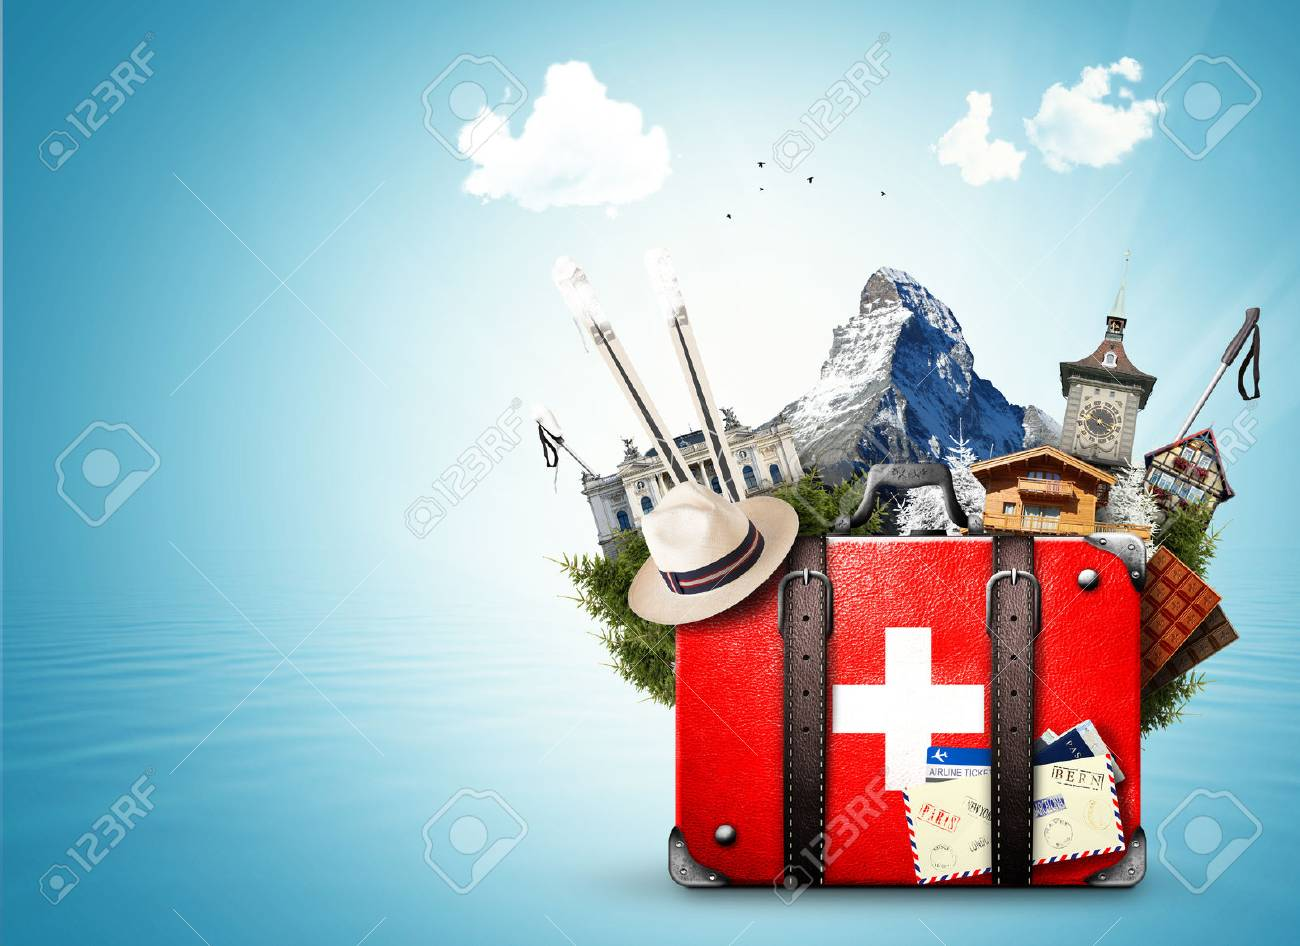 Switzerland, retro suitcase with the sights of Switzerland - 77388732